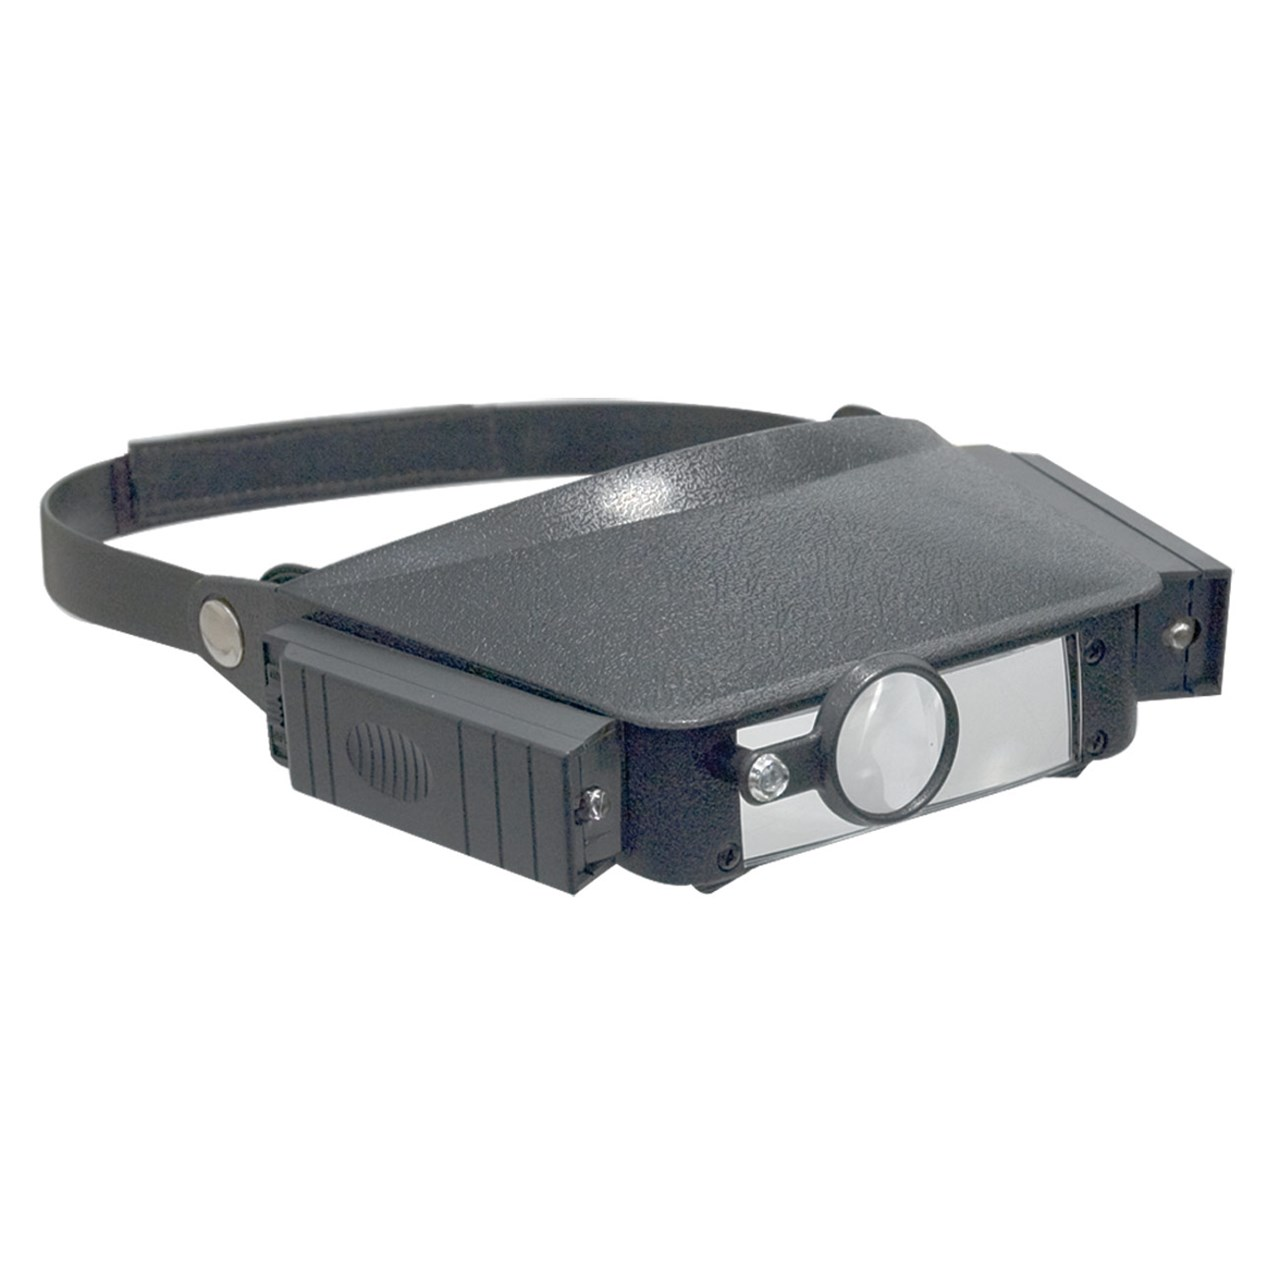 REIZEN Illuminated 2X- 5X Head Band Magnifier